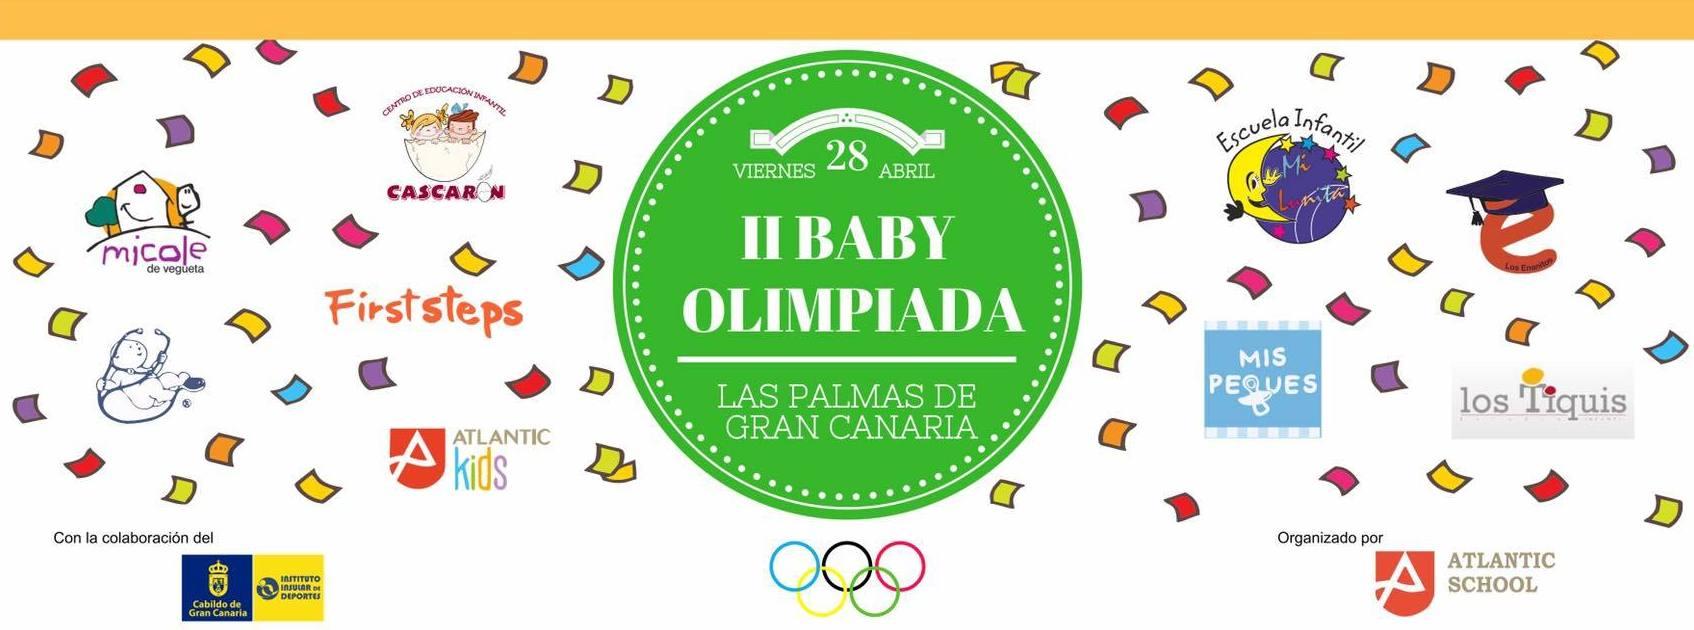 II Baby Olimpiadas